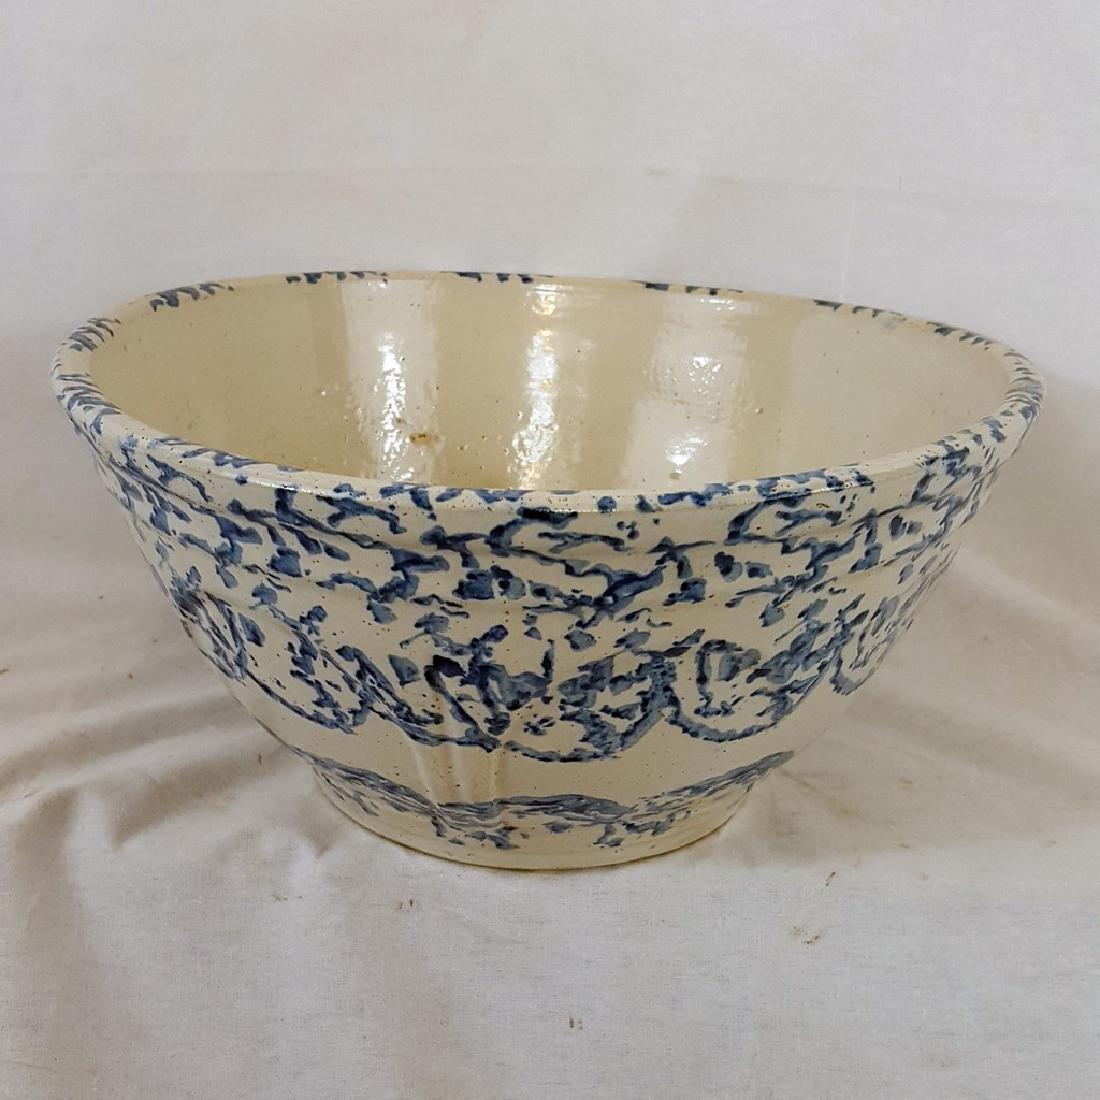 Mint Blue Spongeware Bowl Ca 1880-1900